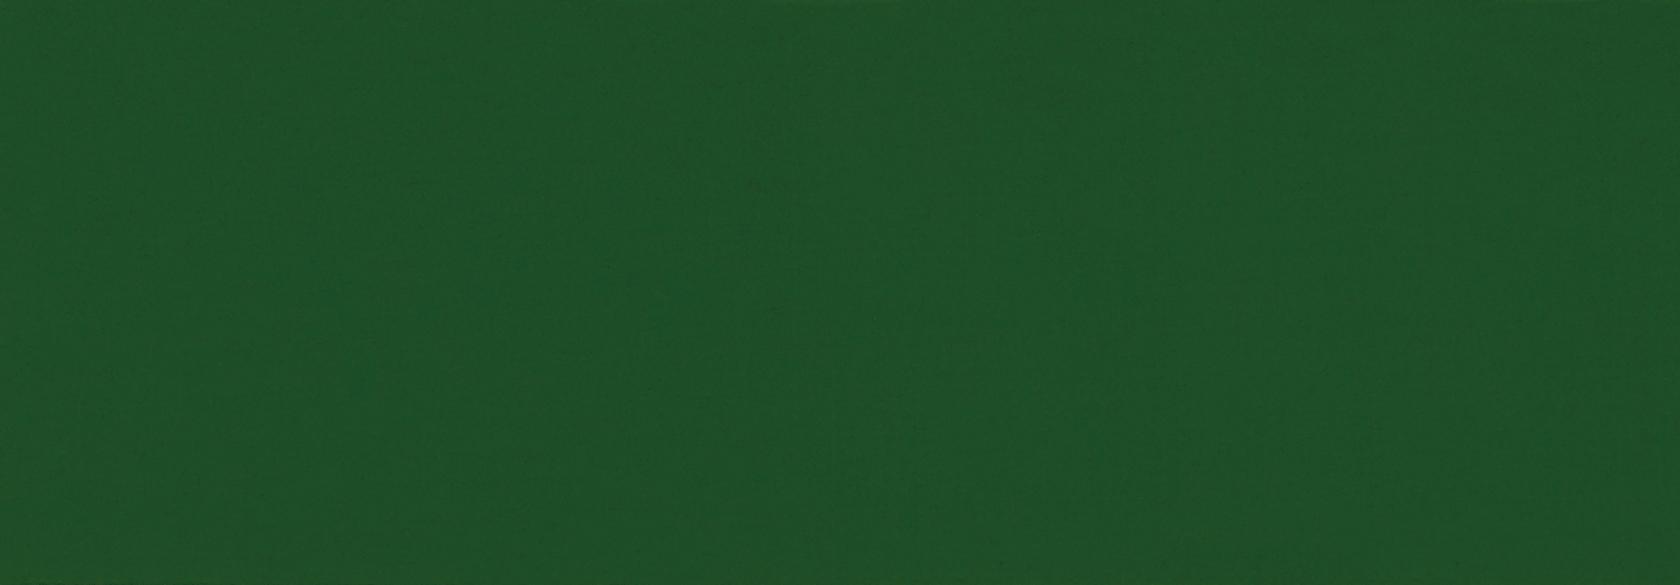 Osmo country colour fir green 750ml